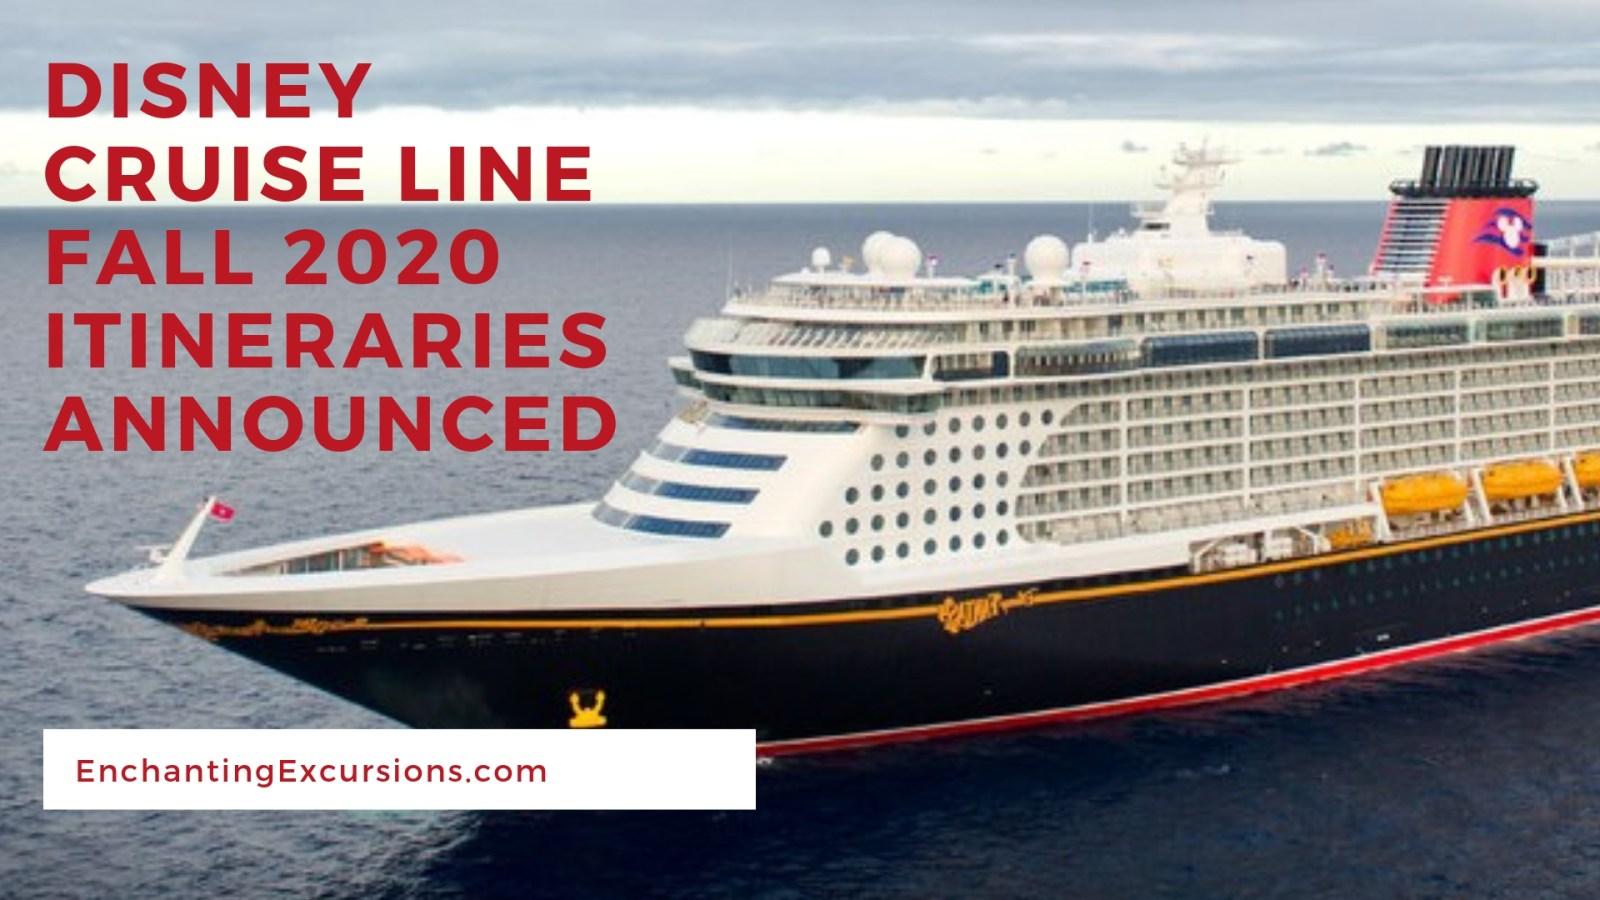 Disney Cruise 2020.Disney Cruise Line Announces Fall 2020 Itineraries